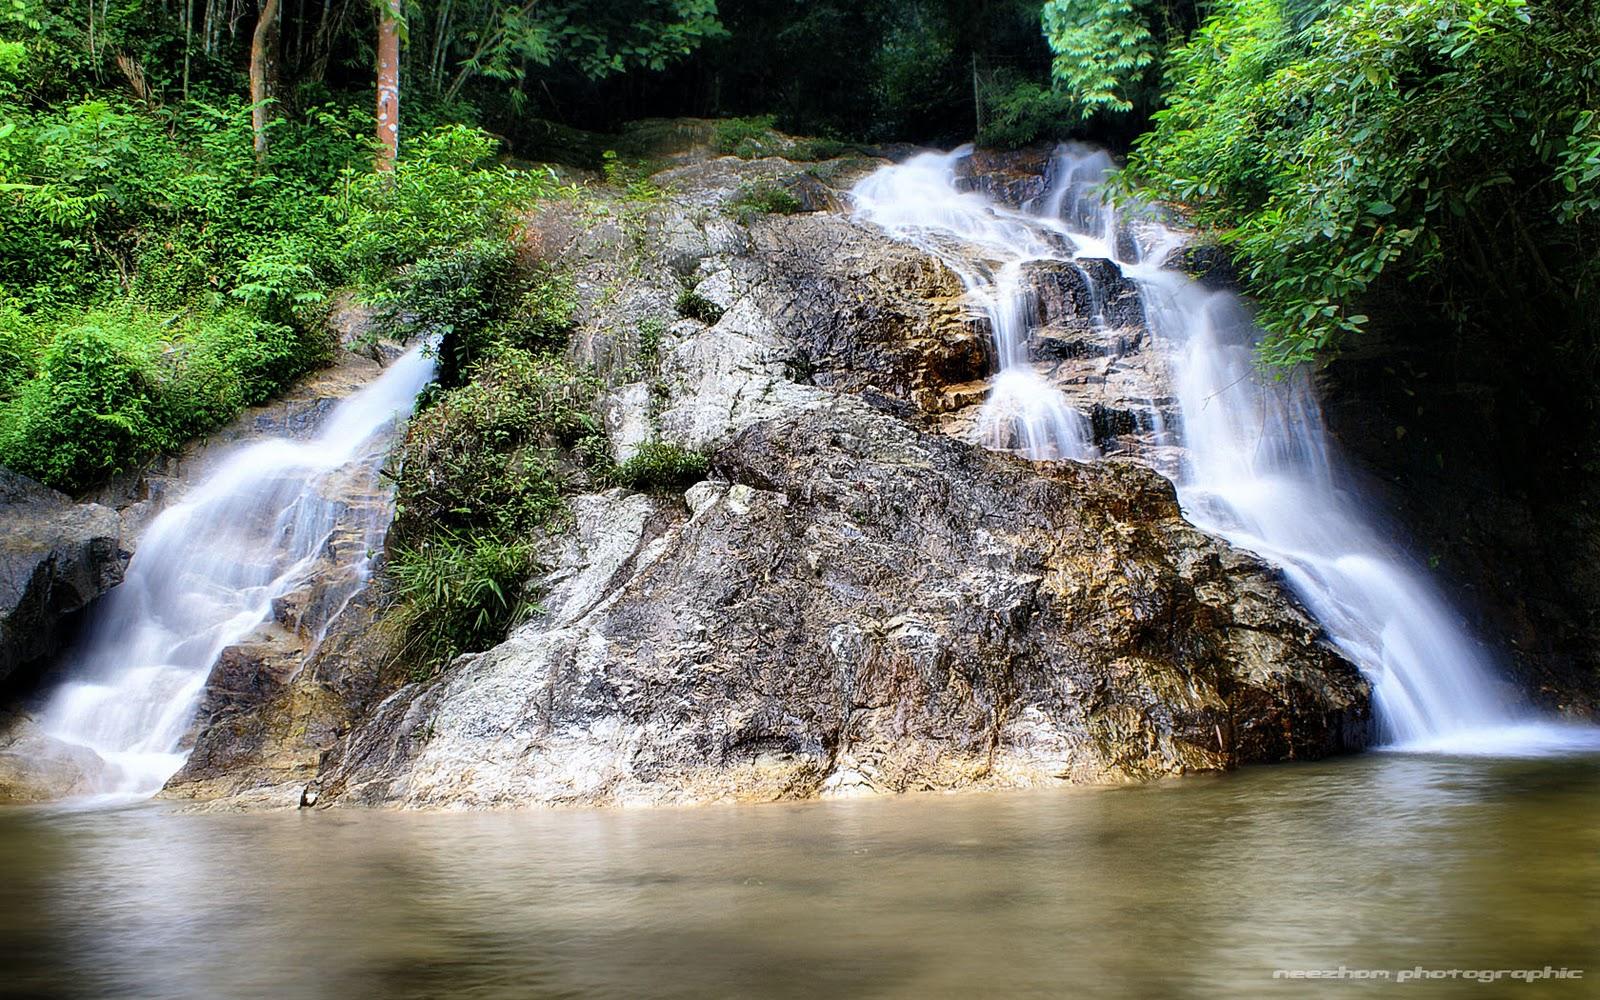 Air  terjun  Ulu Yam Hulu Selangor Neezhom Photomalaya